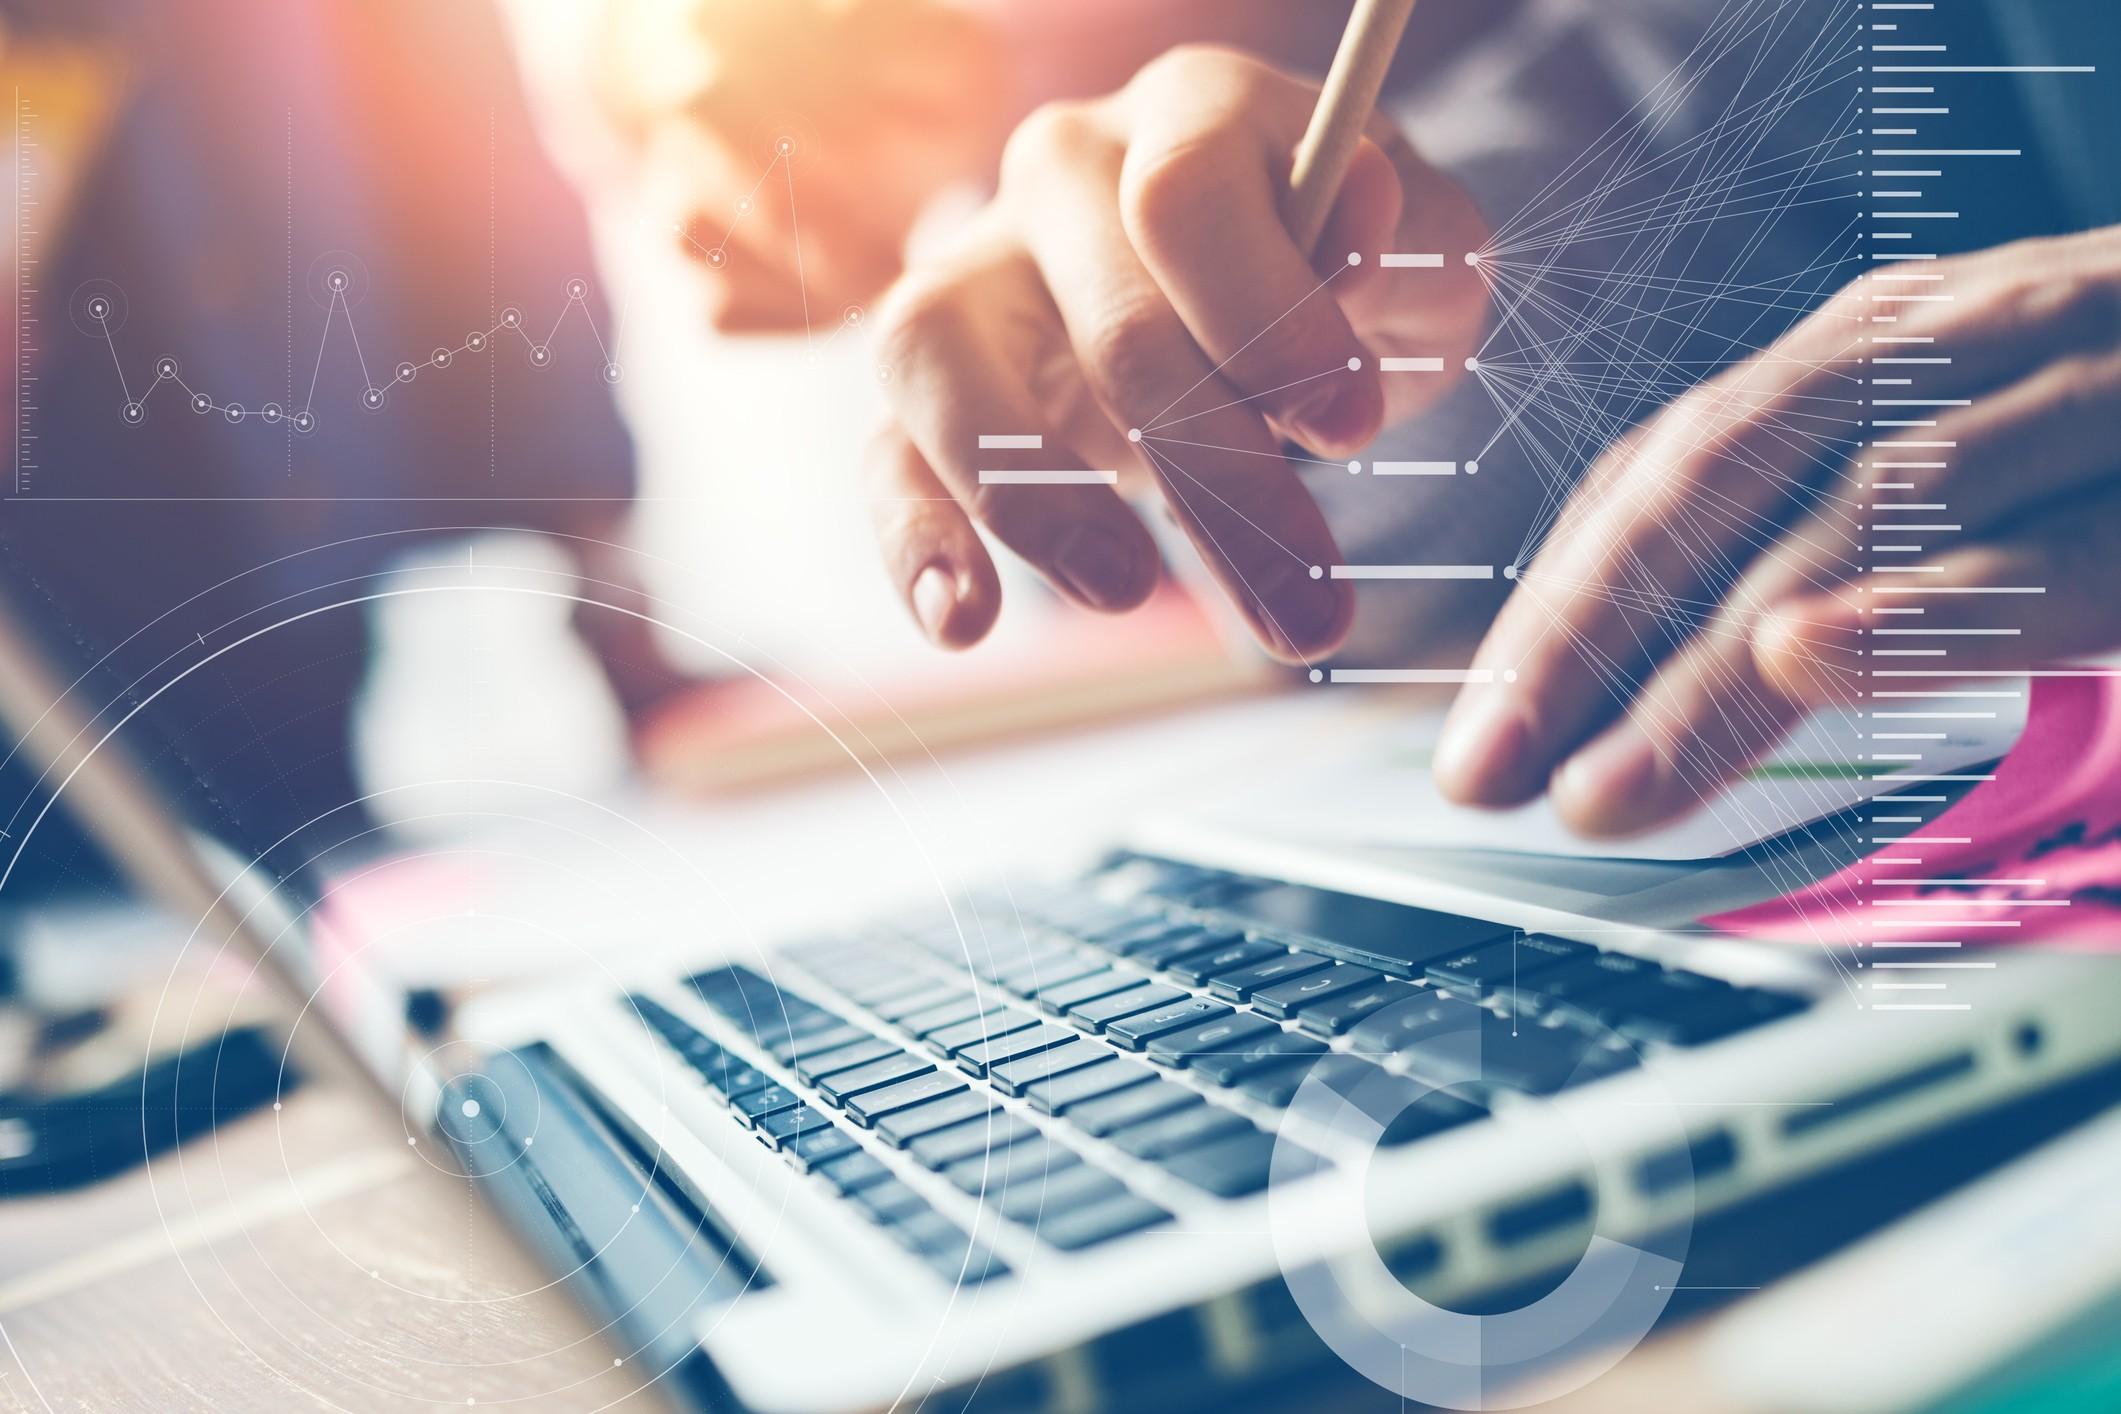 Sites auxiliam a monitorar a concorrência e encontrar insights (Foto: Thinkstock)